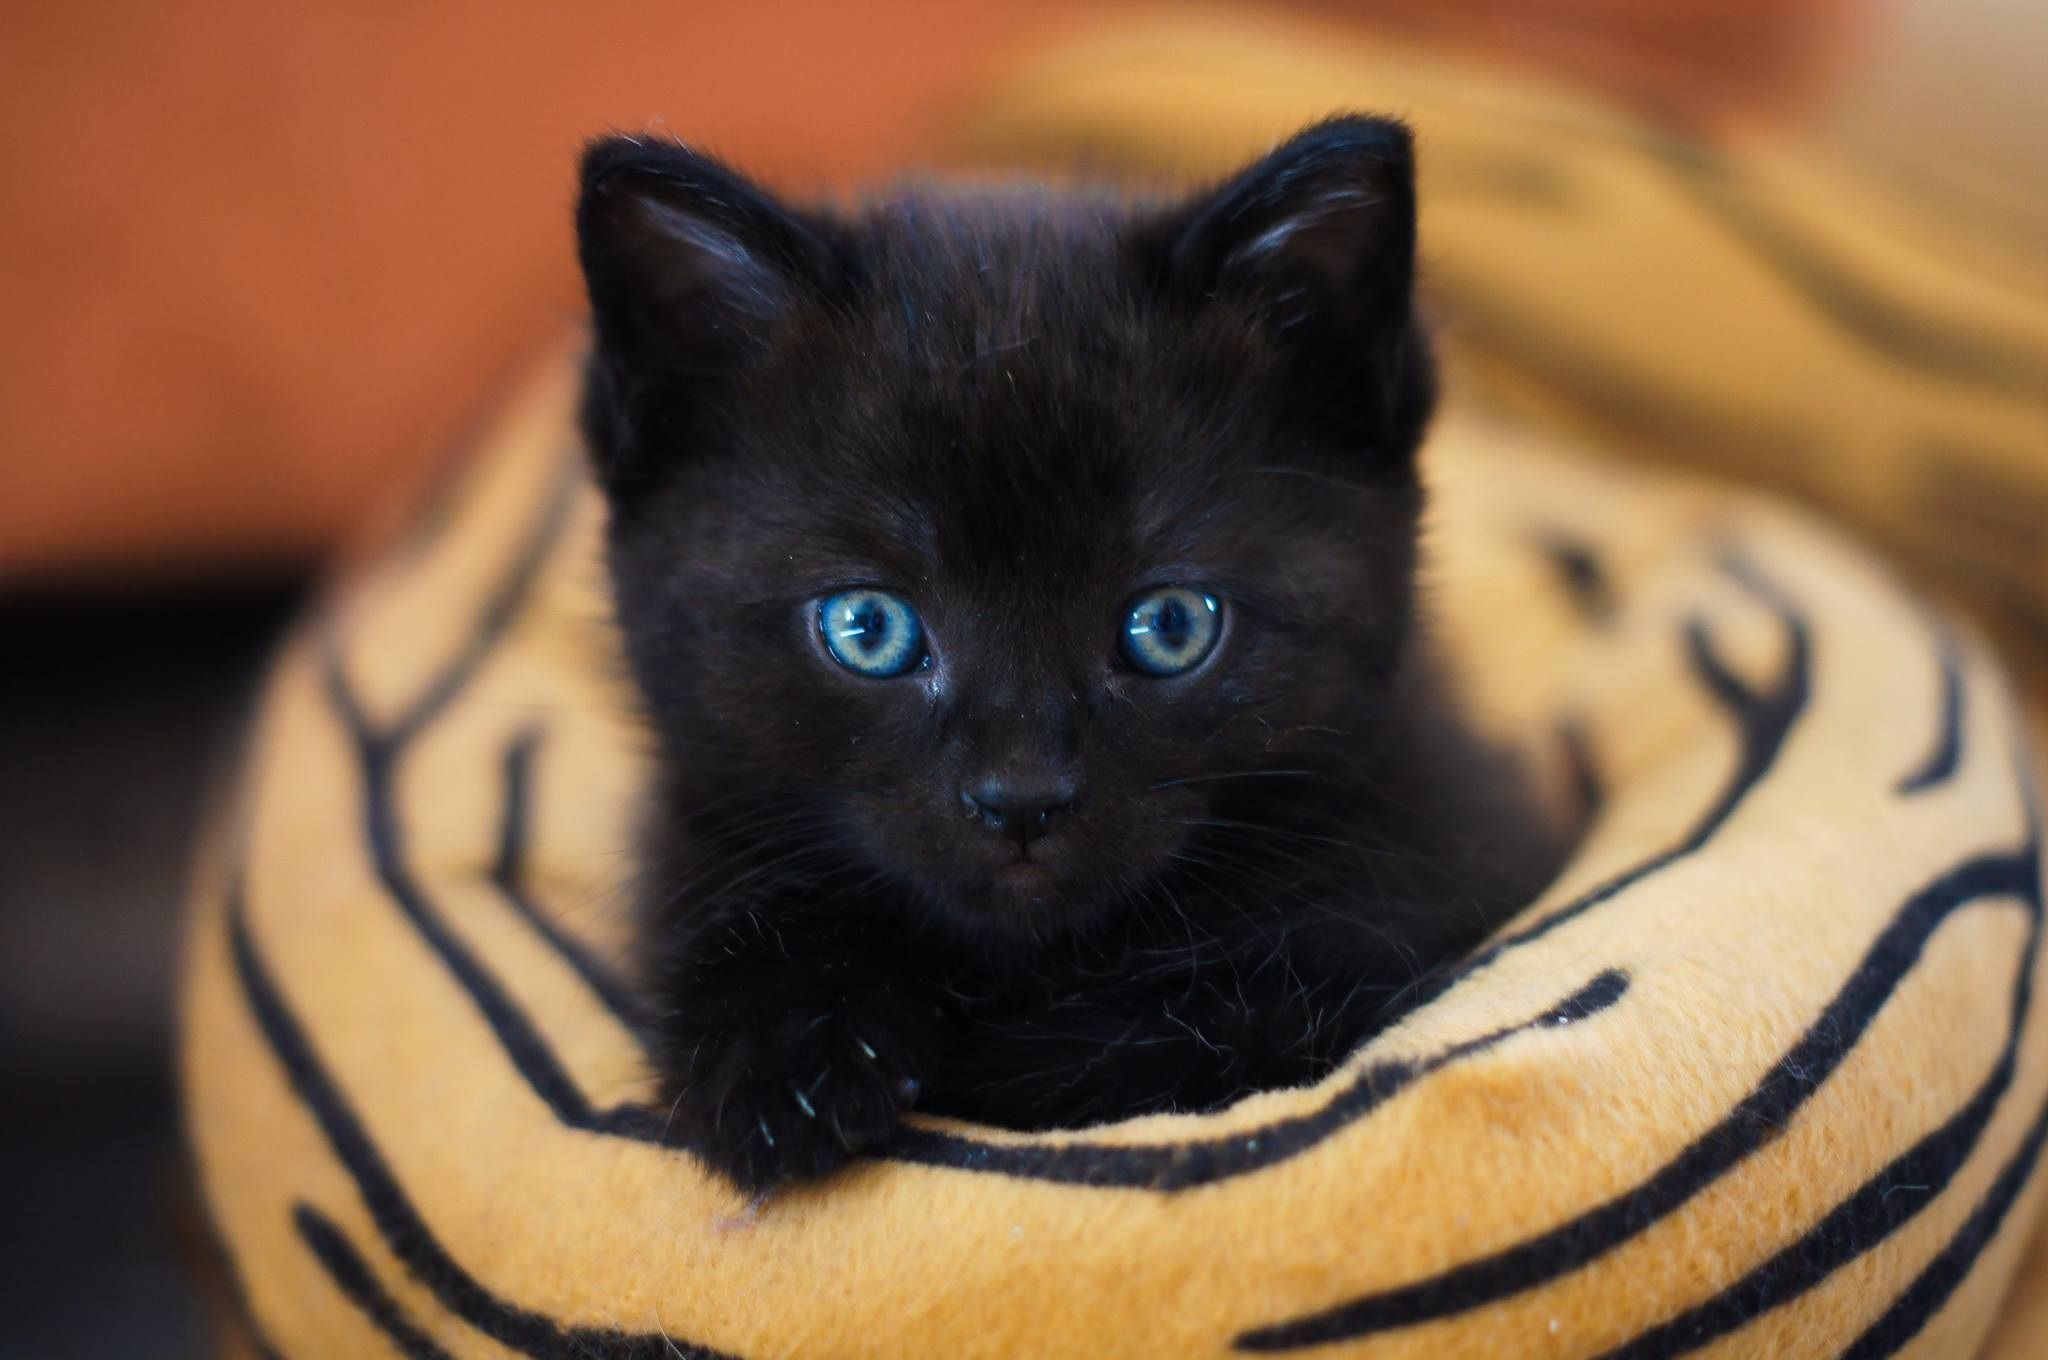 Blue Eyed Kitten Black Cat Breeds Names For Black Cats Black Cat Pictures